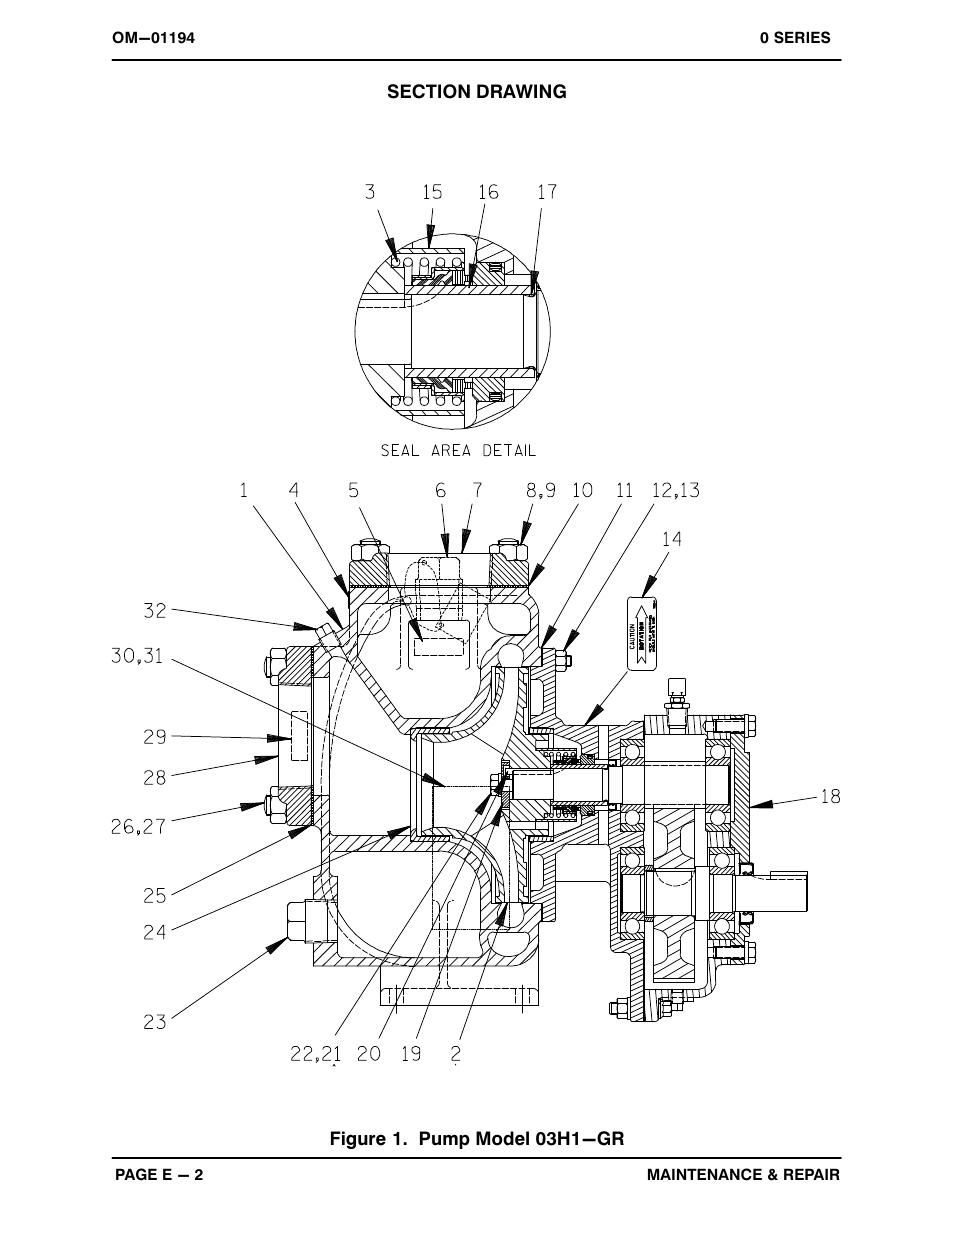 Figure 1  Pump Model 03h1